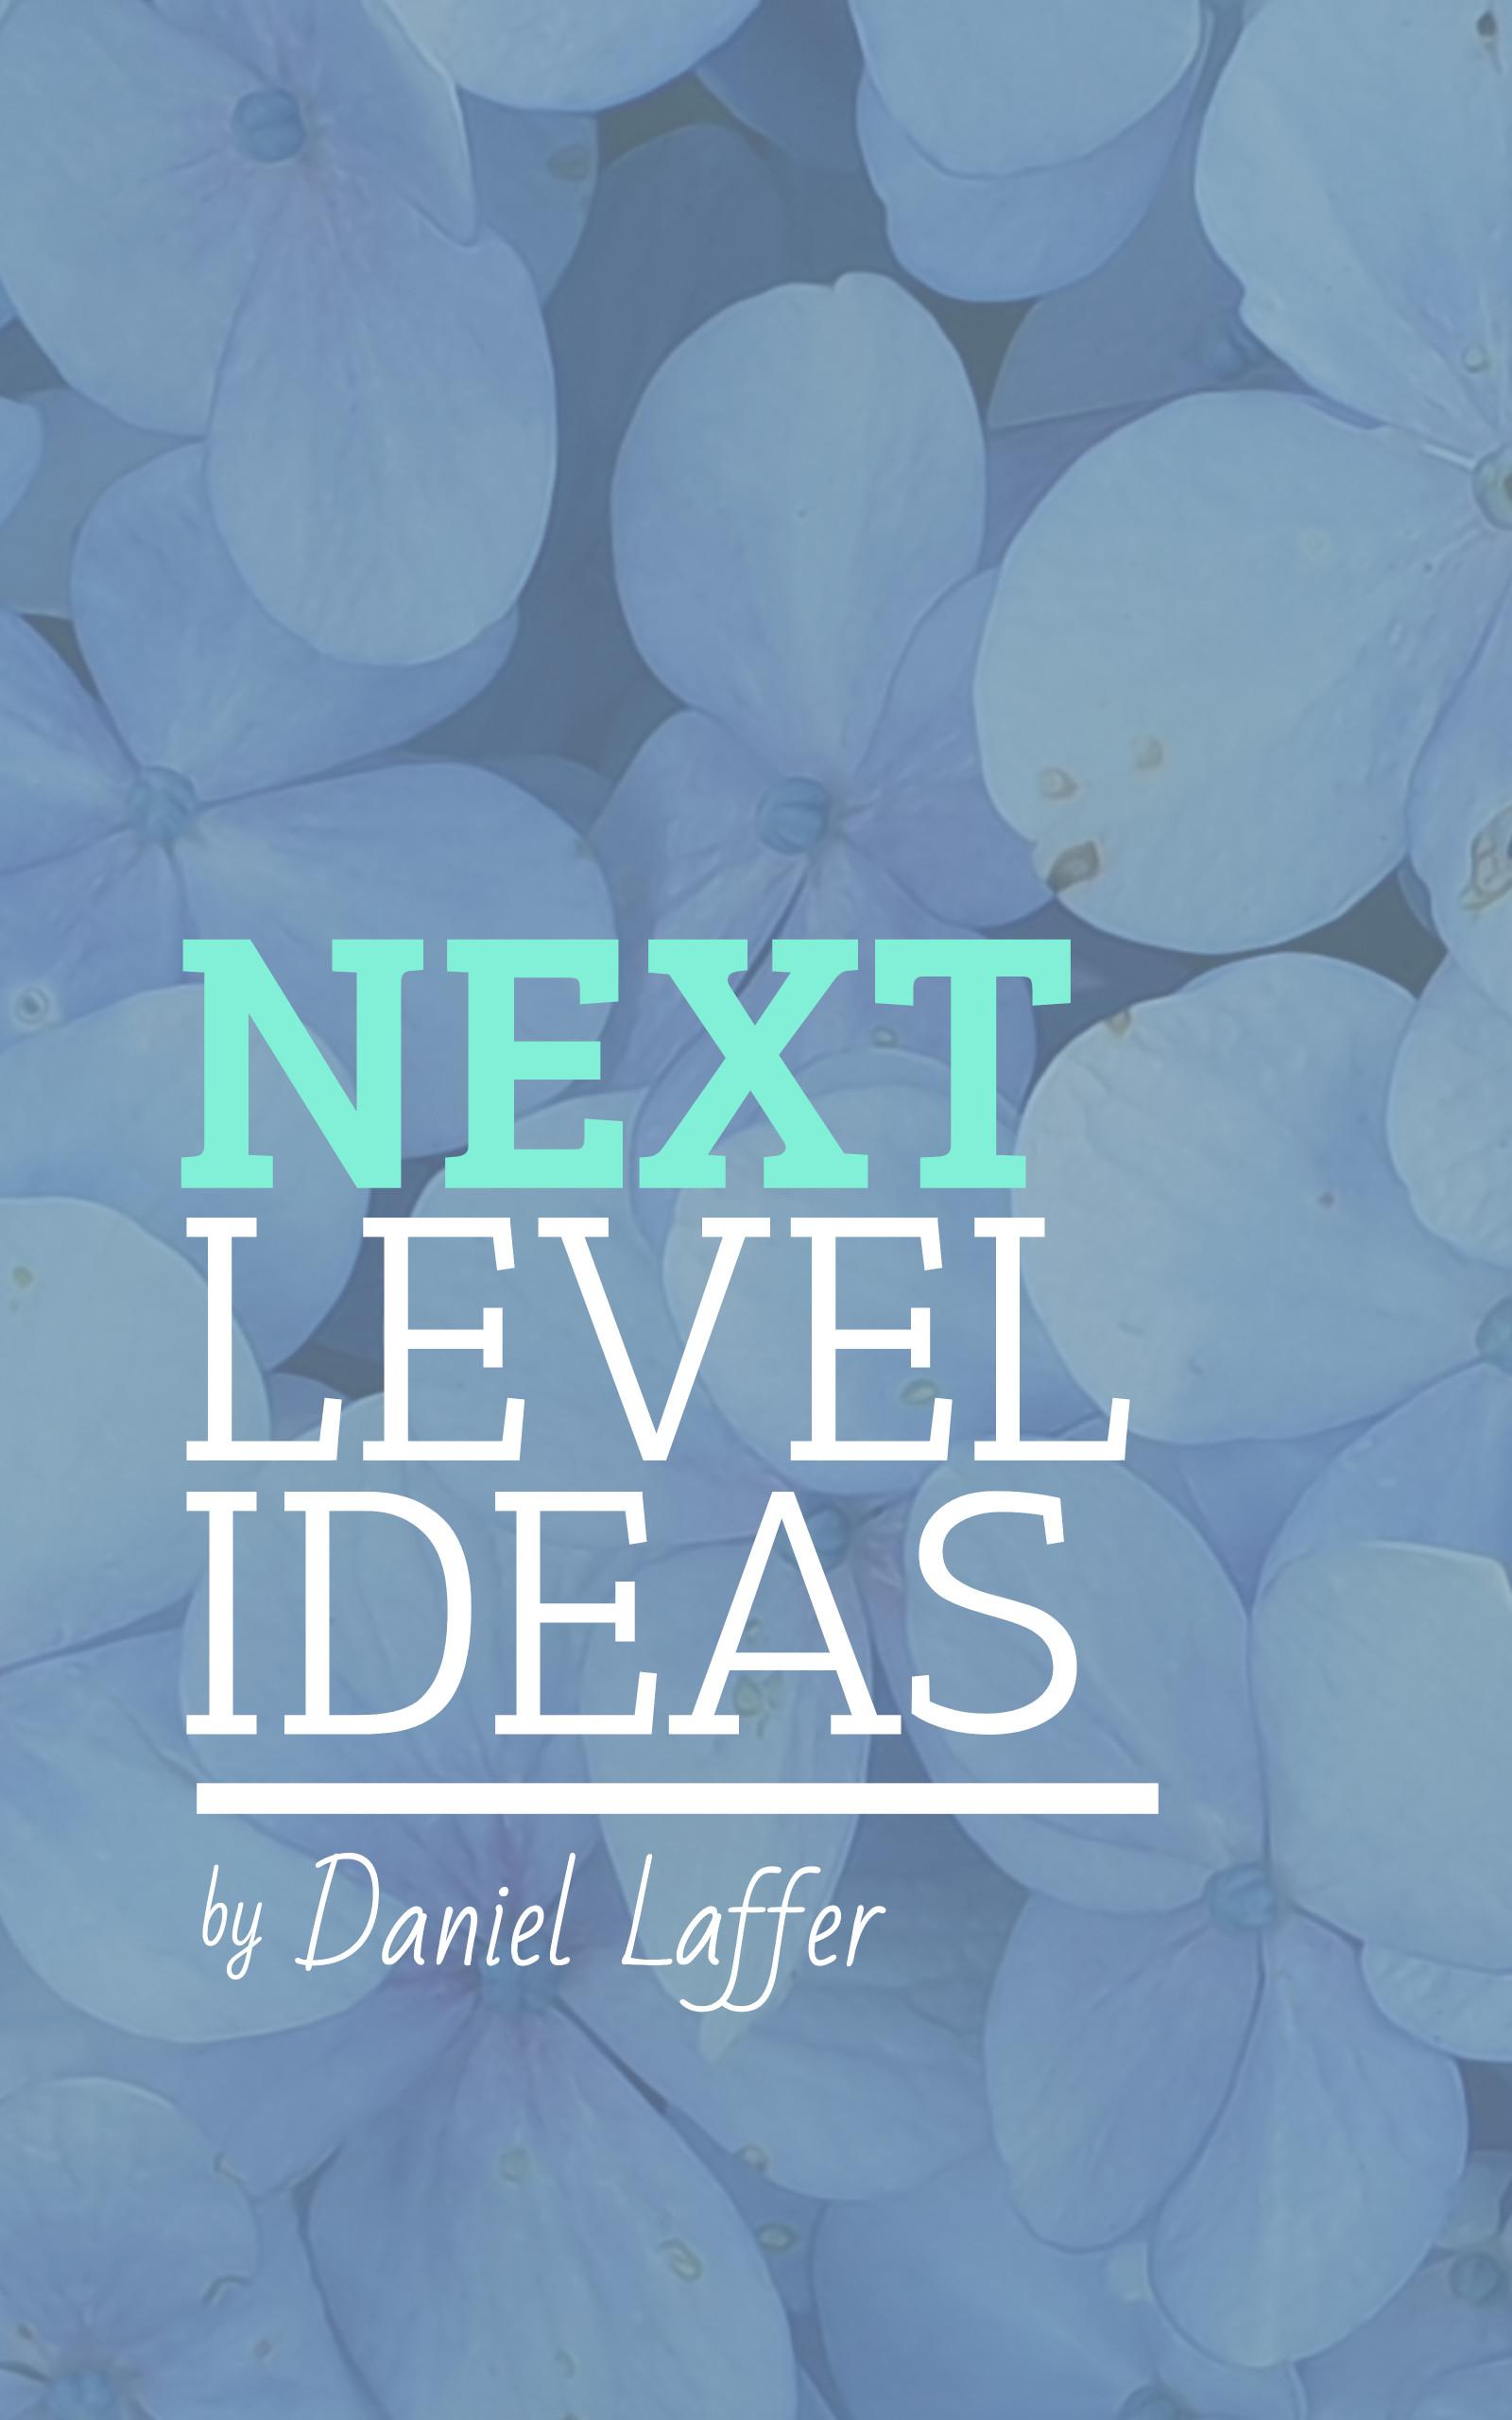 Next Level Ideas